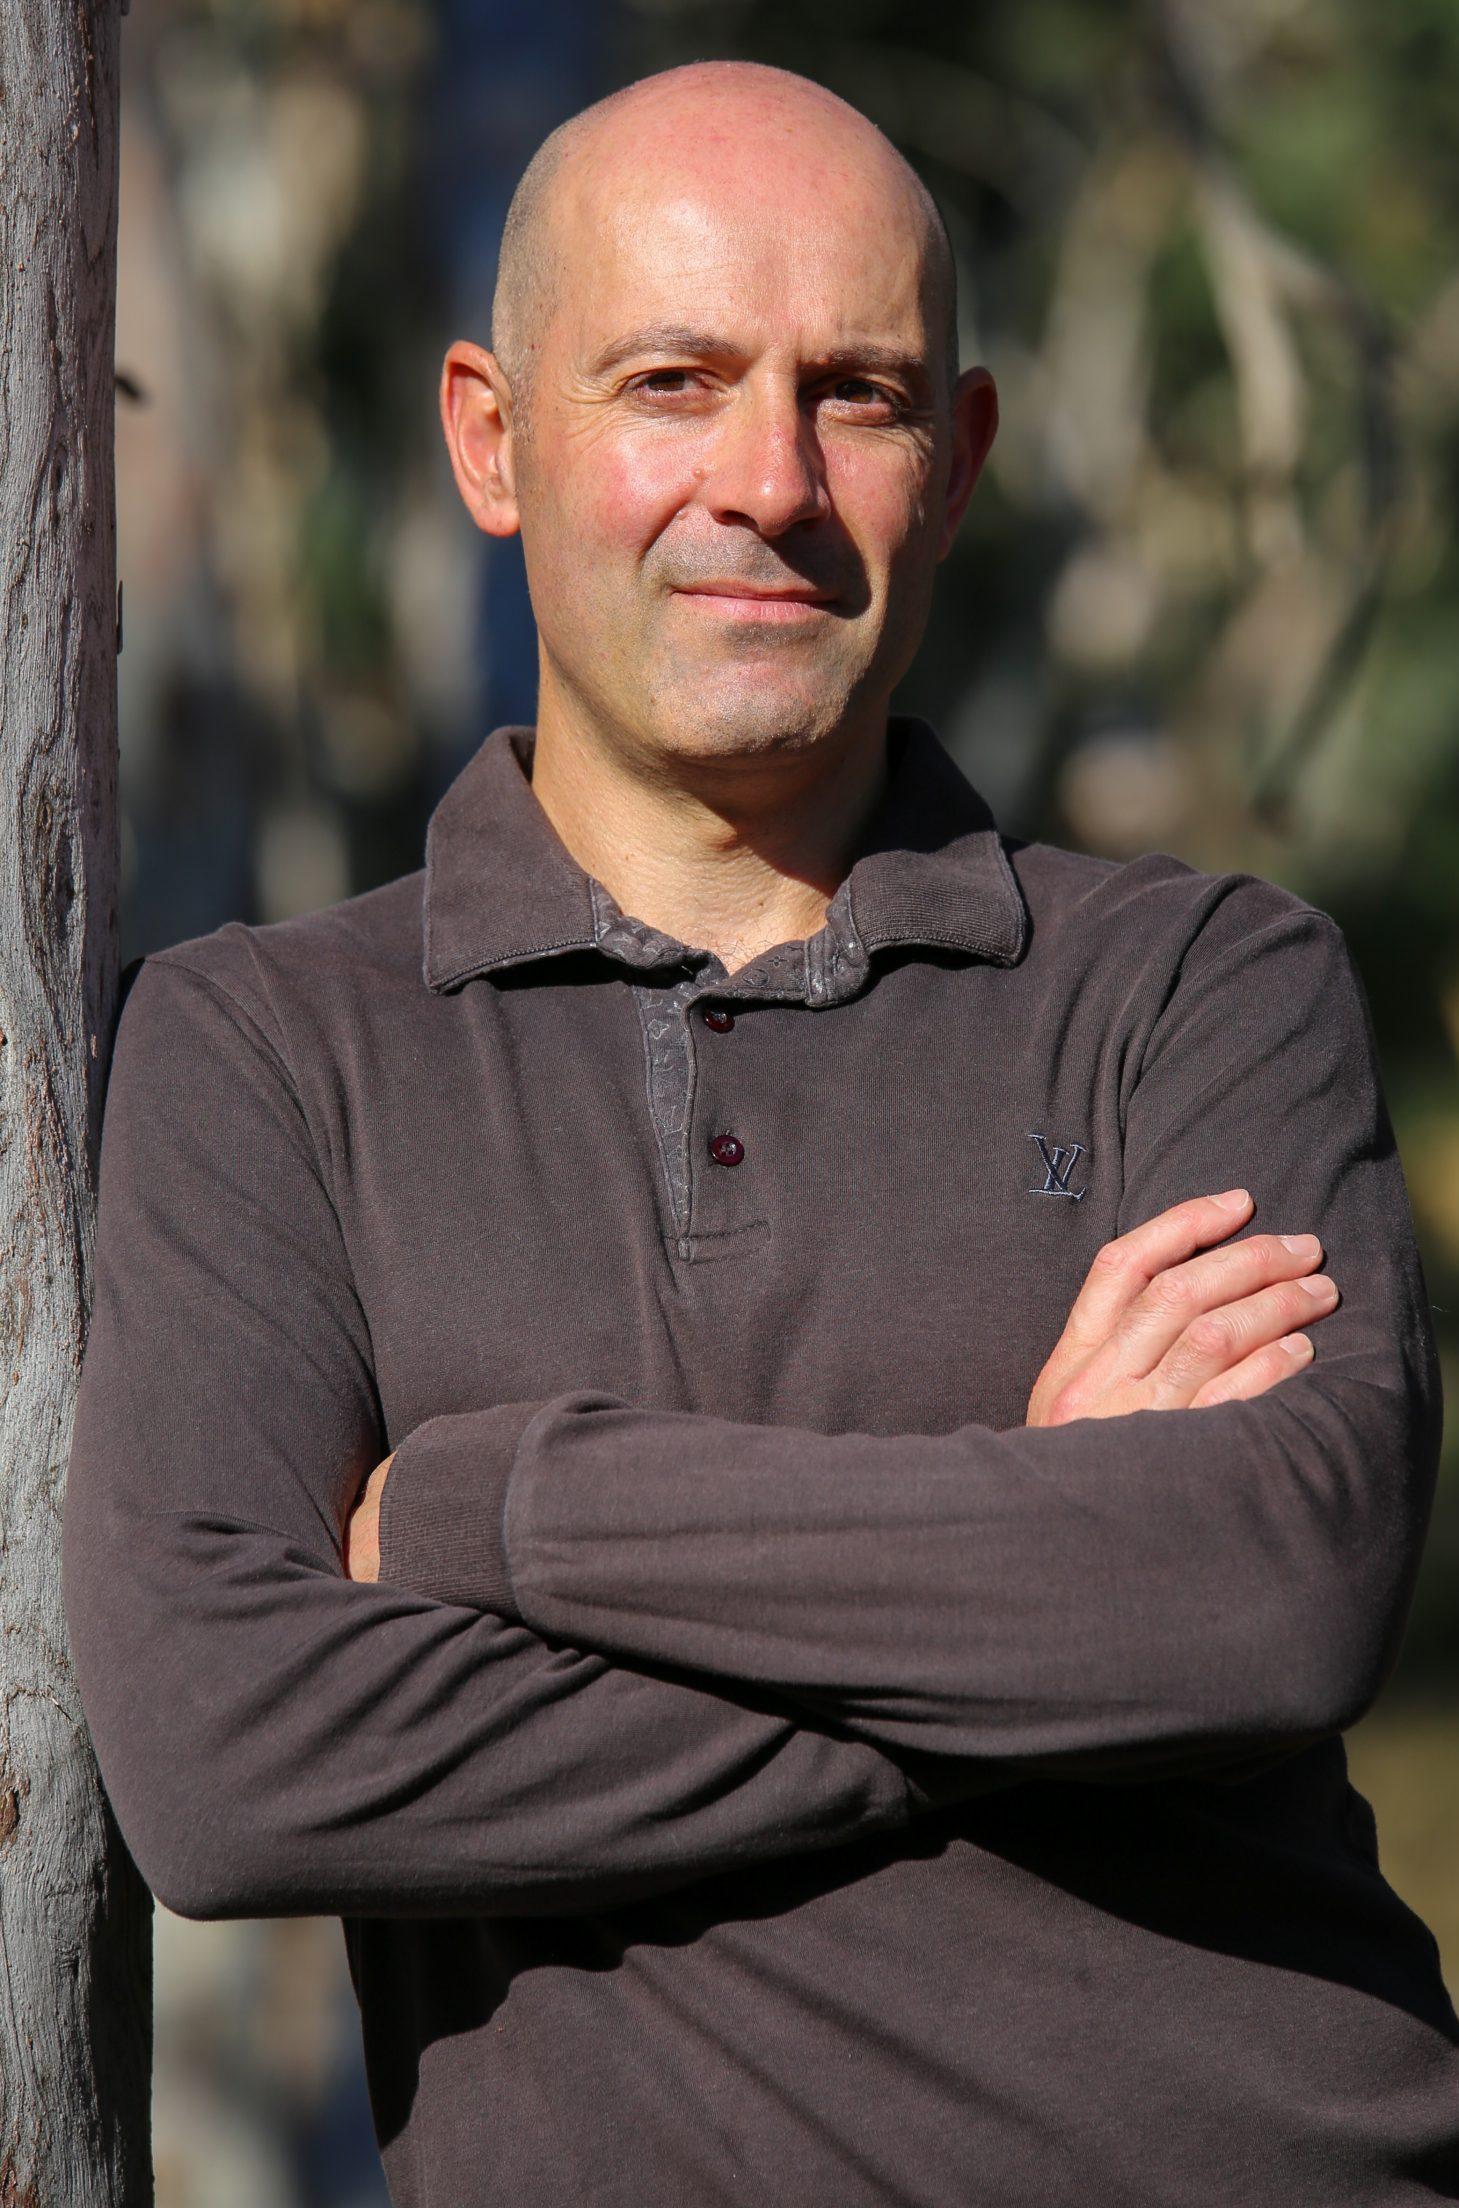 Peter Papathanasiou